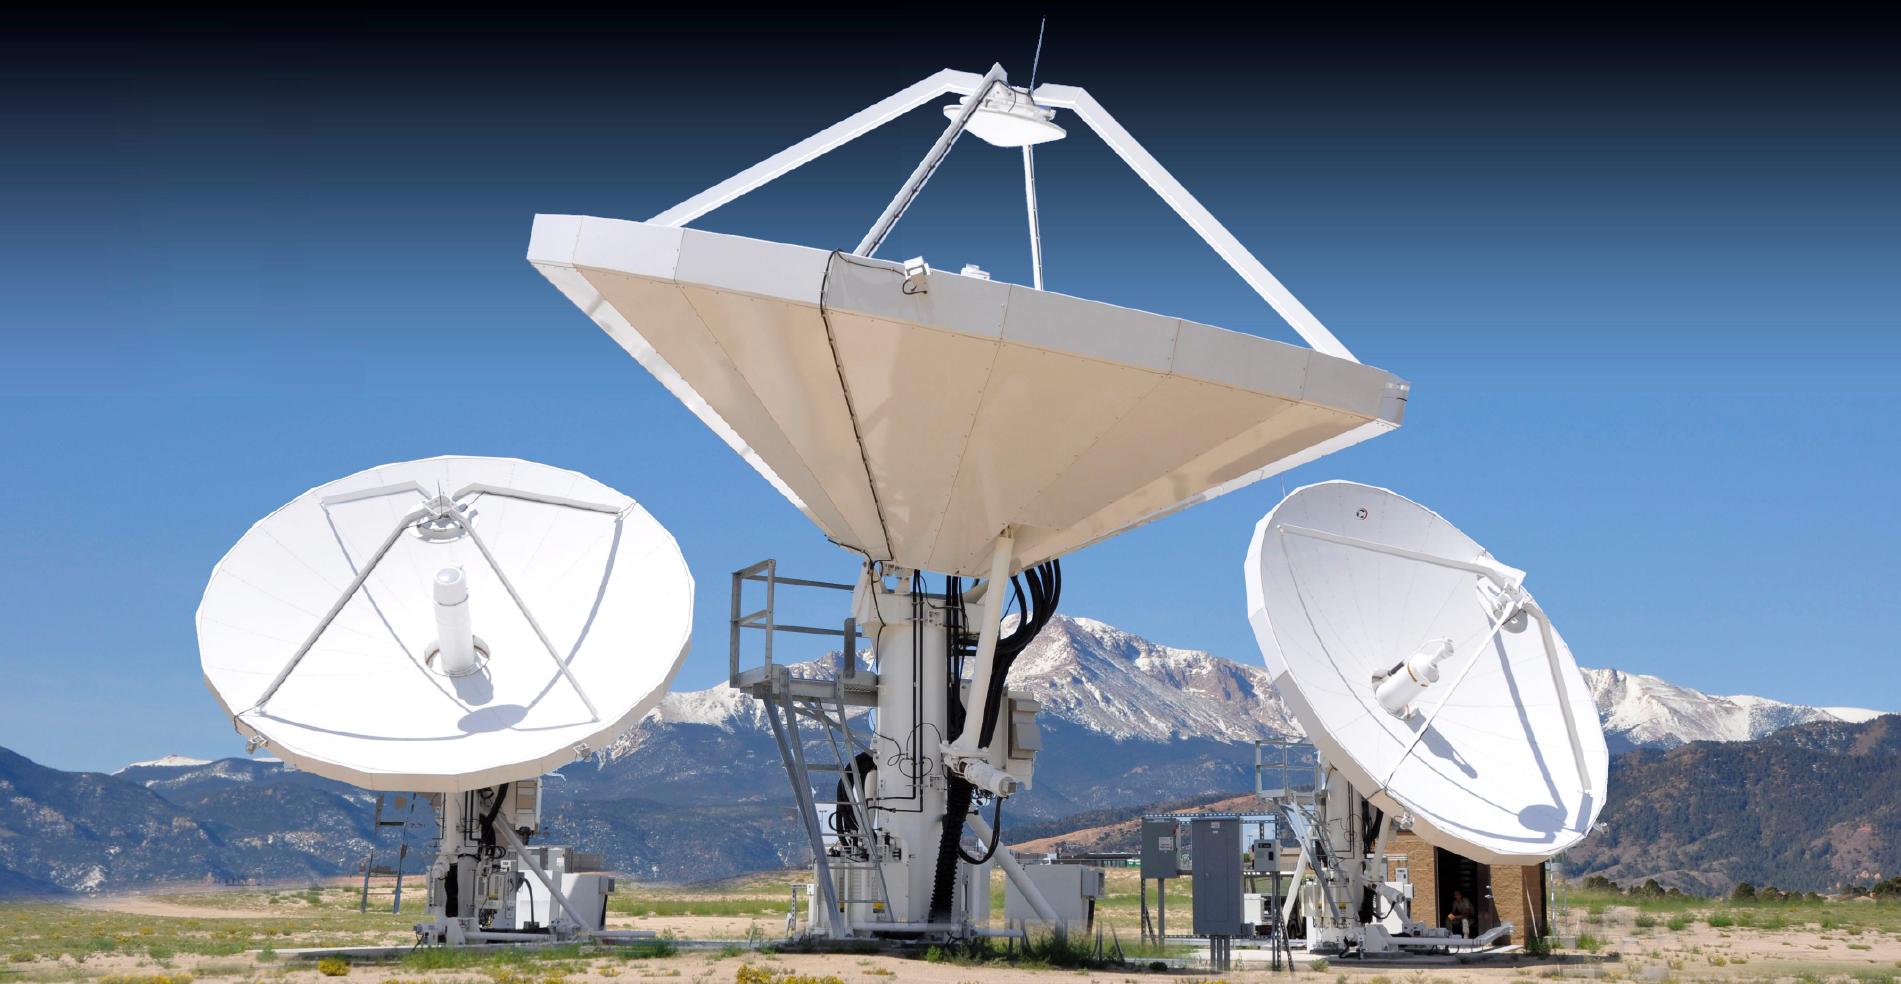 7.3m. Antenna